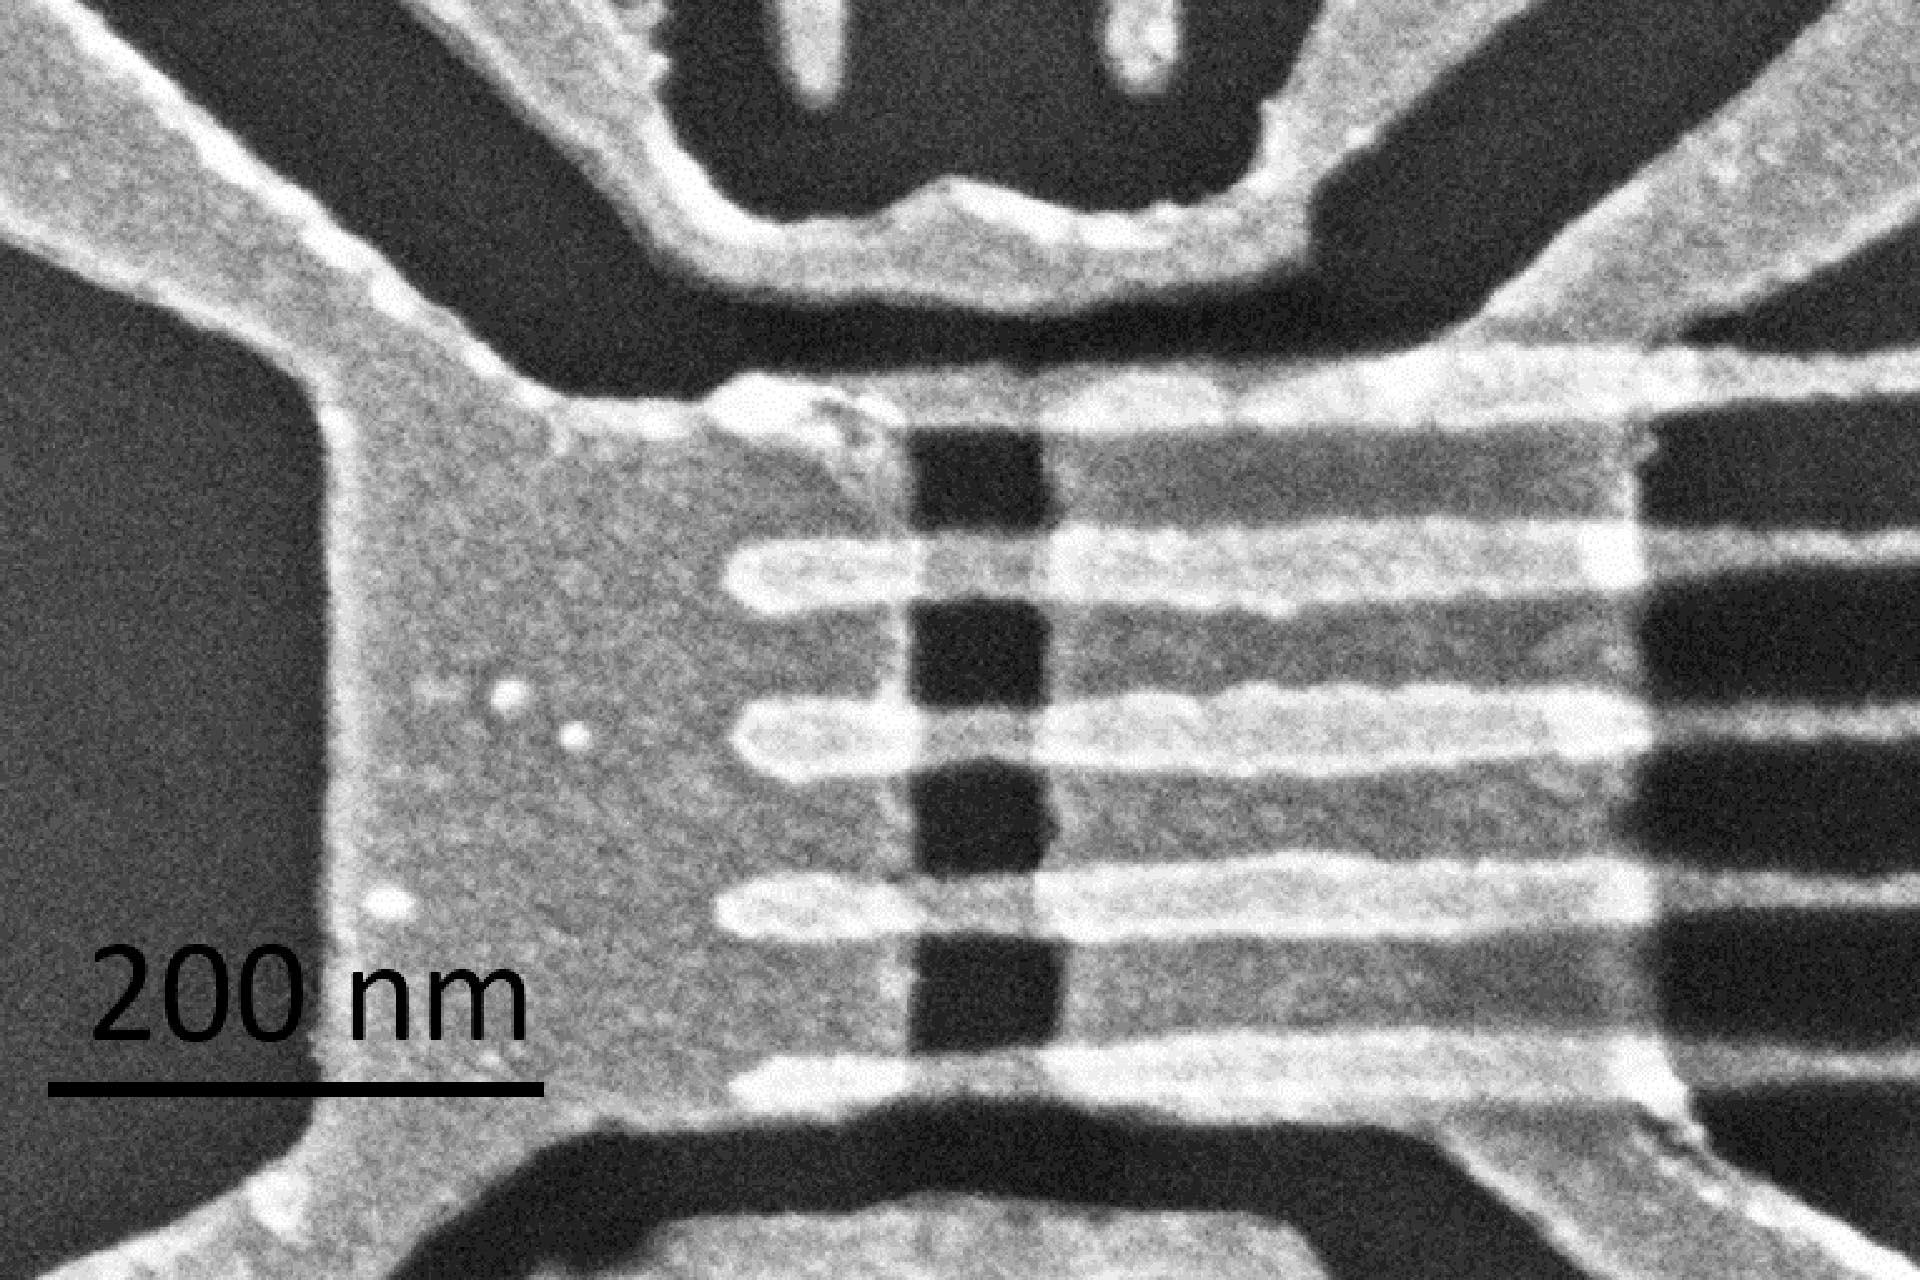 Gate electrode arrays